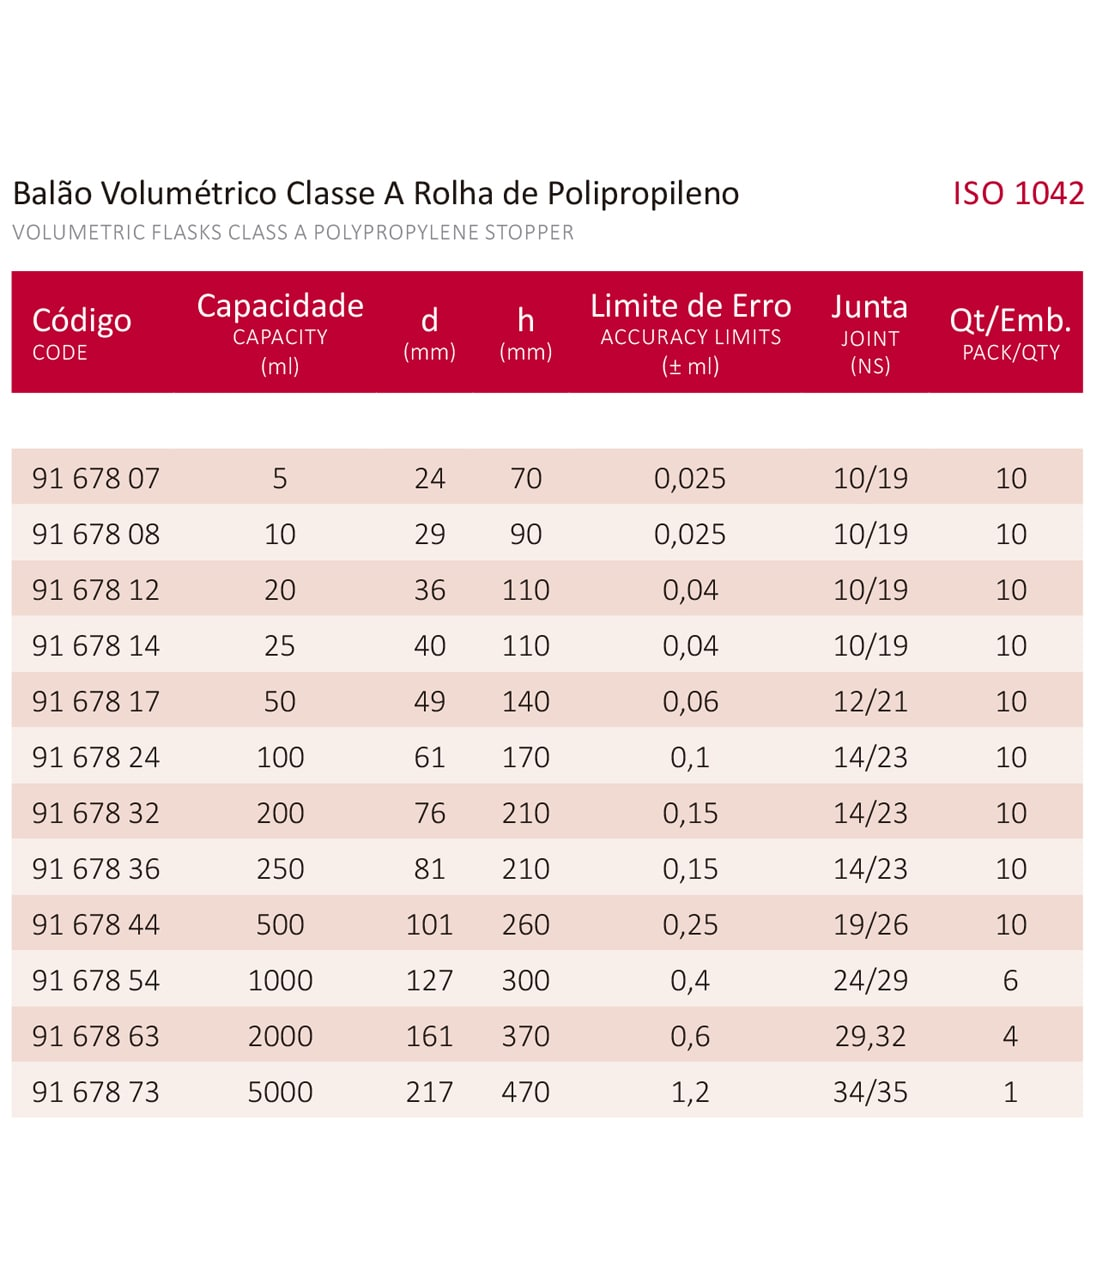 BALÃO VOLUMÉTRICO CLASSE A ROLHA POLI C/ CERTIFICADO  RBC 15 ML - Marca Laborglas - Cód. 9167811-R